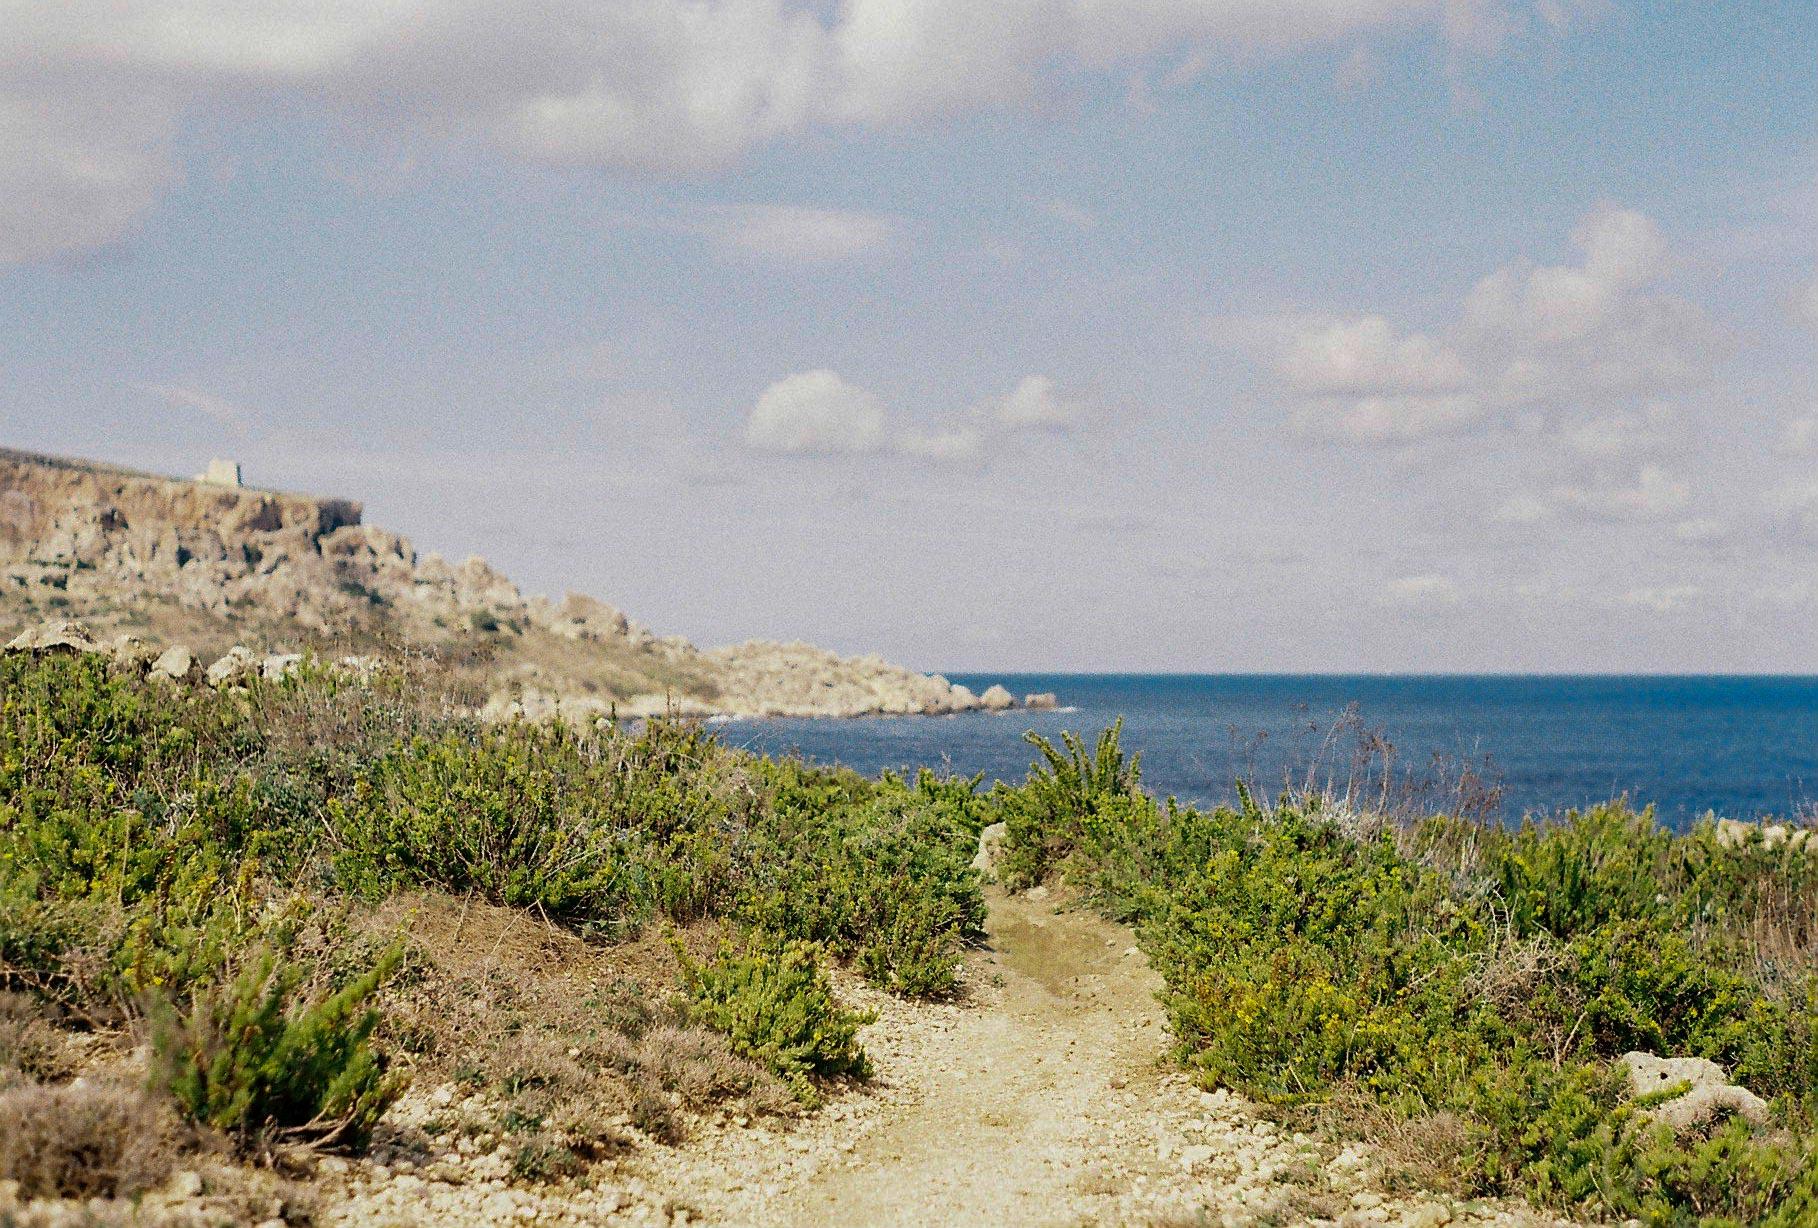 Footpath in Malta